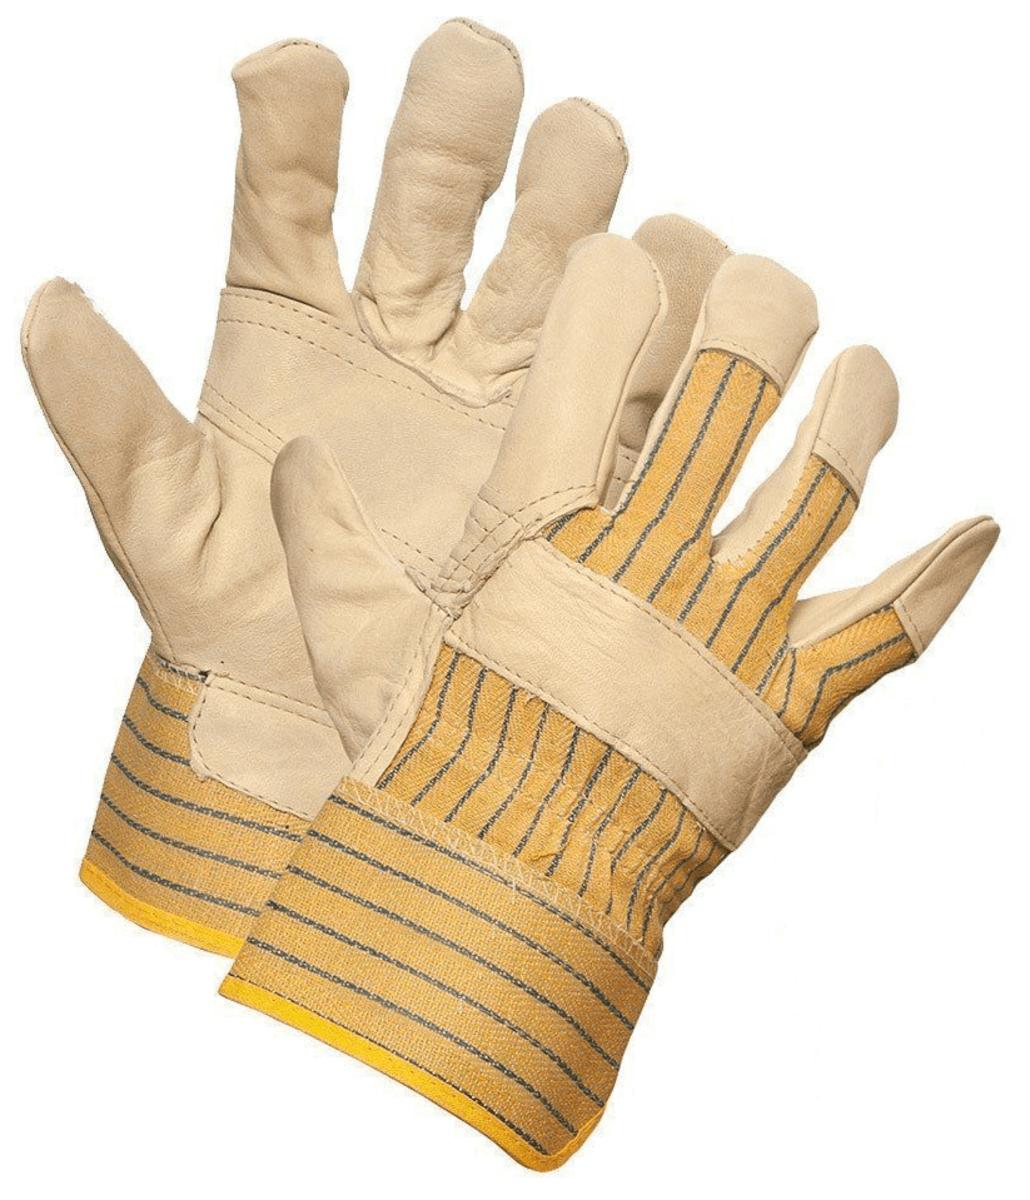 GlovesFitterW/PatchPalmFullGrain,XL